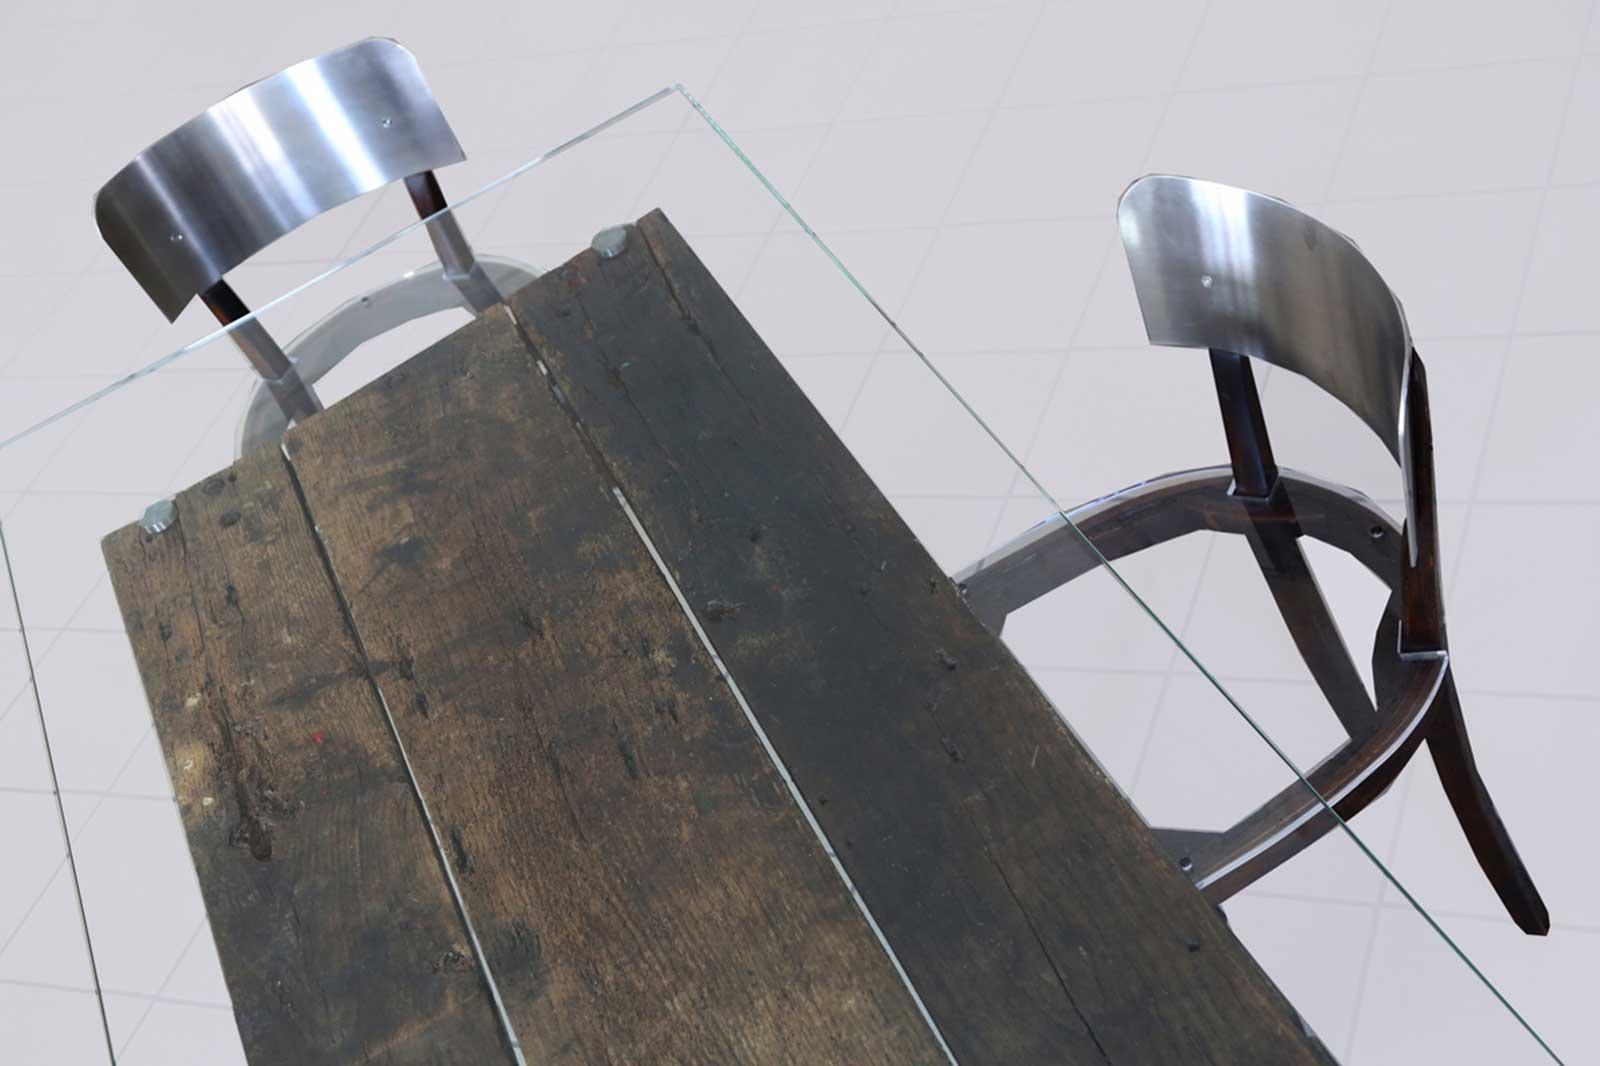 Tavolo 3 Mat - Poligoni - Interior design made in Italy